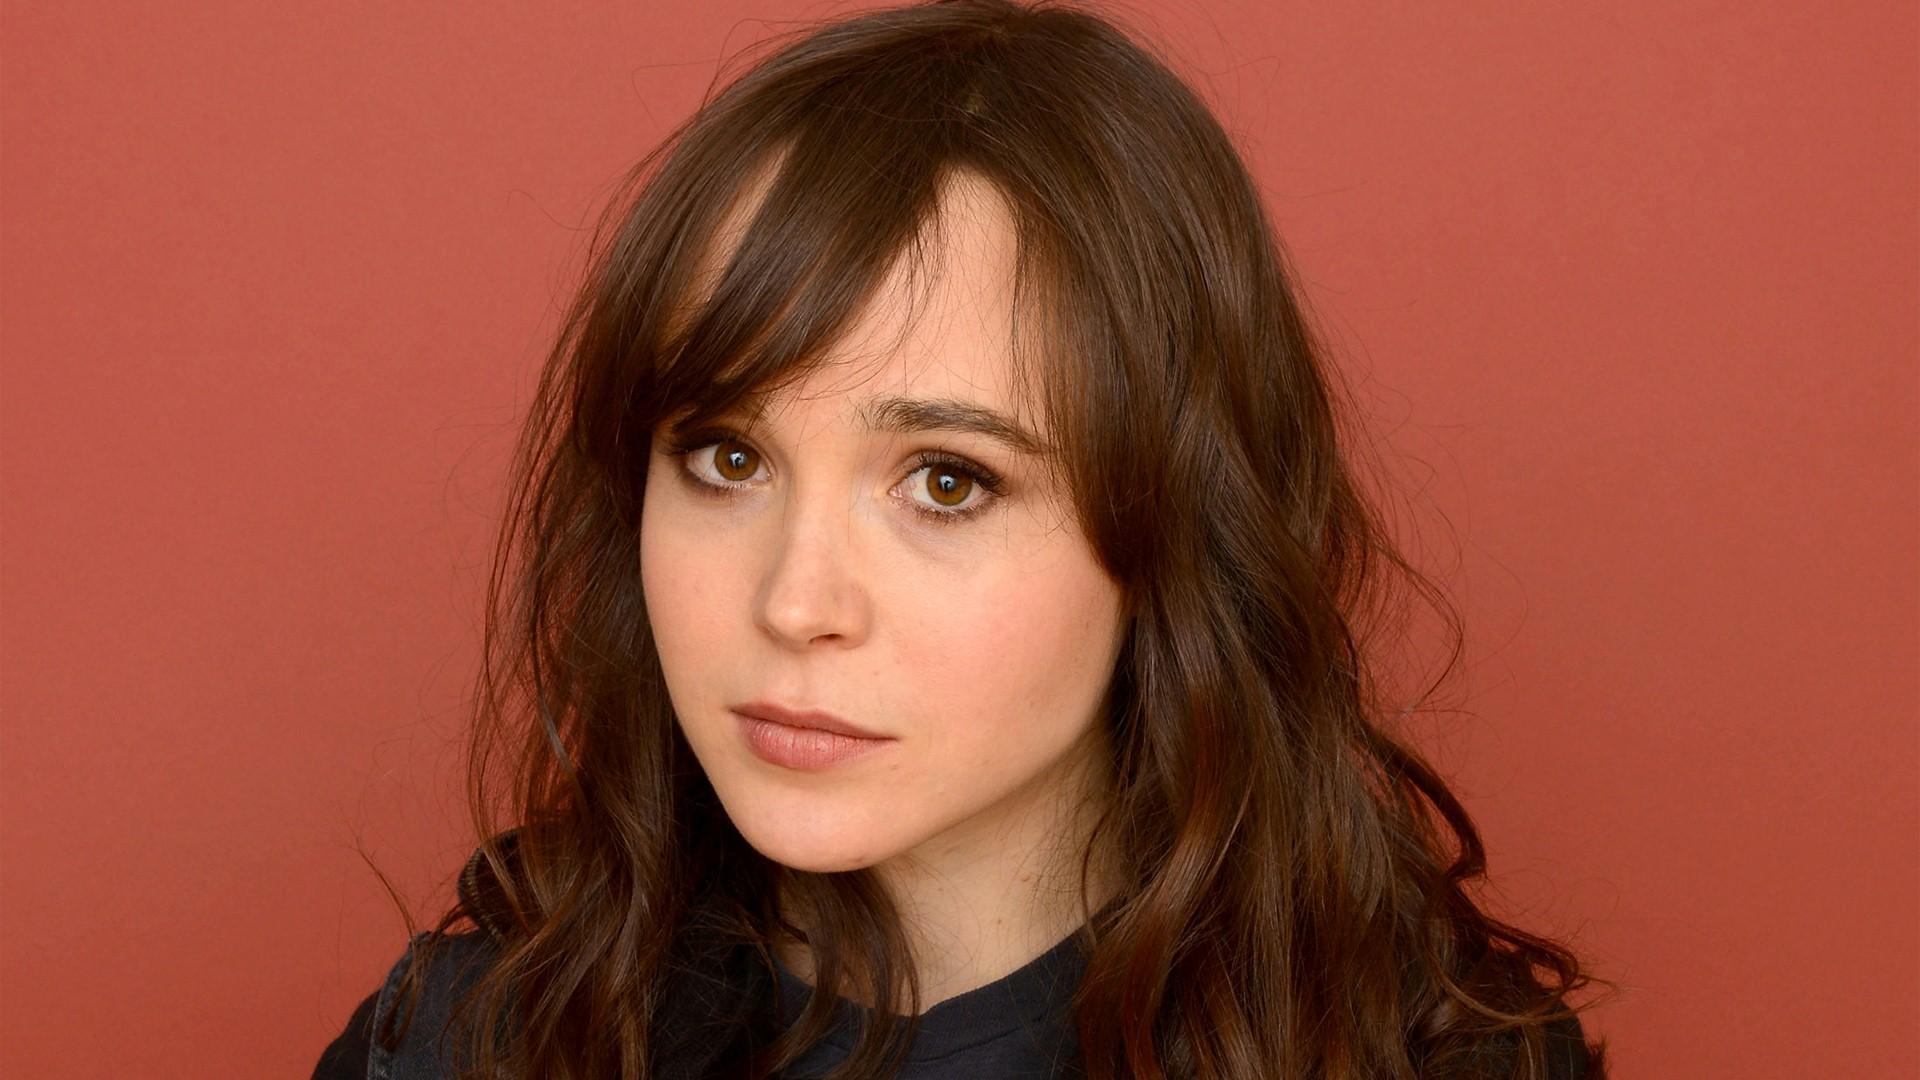 Fashion Ellen Page wallpapers (1069)